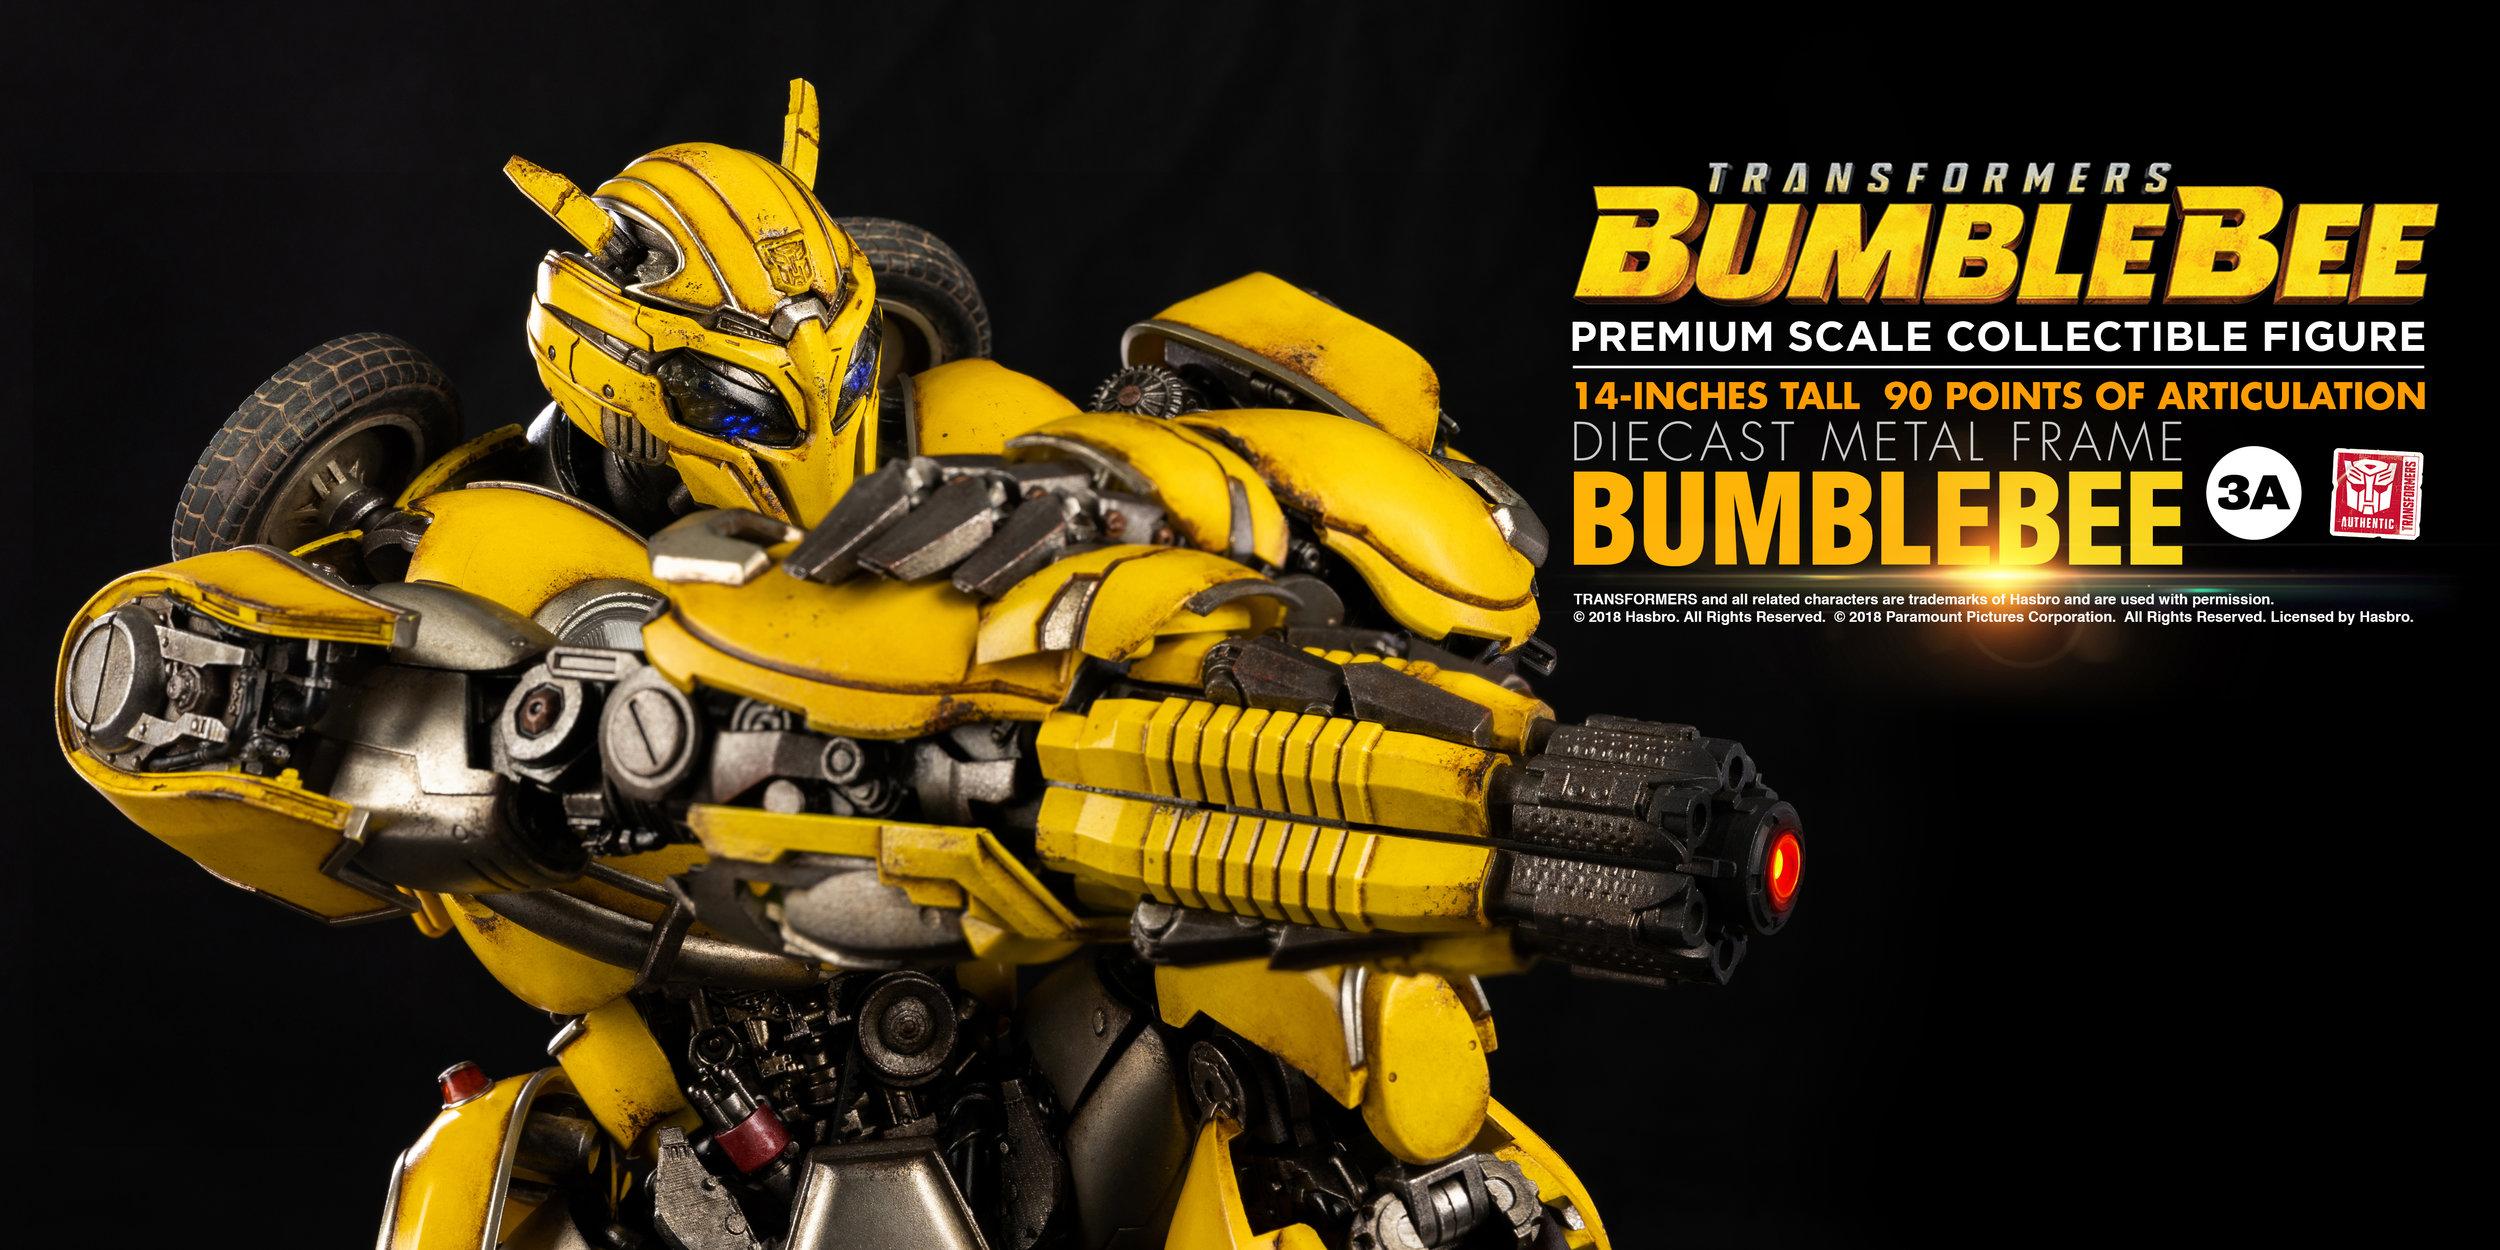 Bumblebee_ENG_PM_WIDE_007.jpg